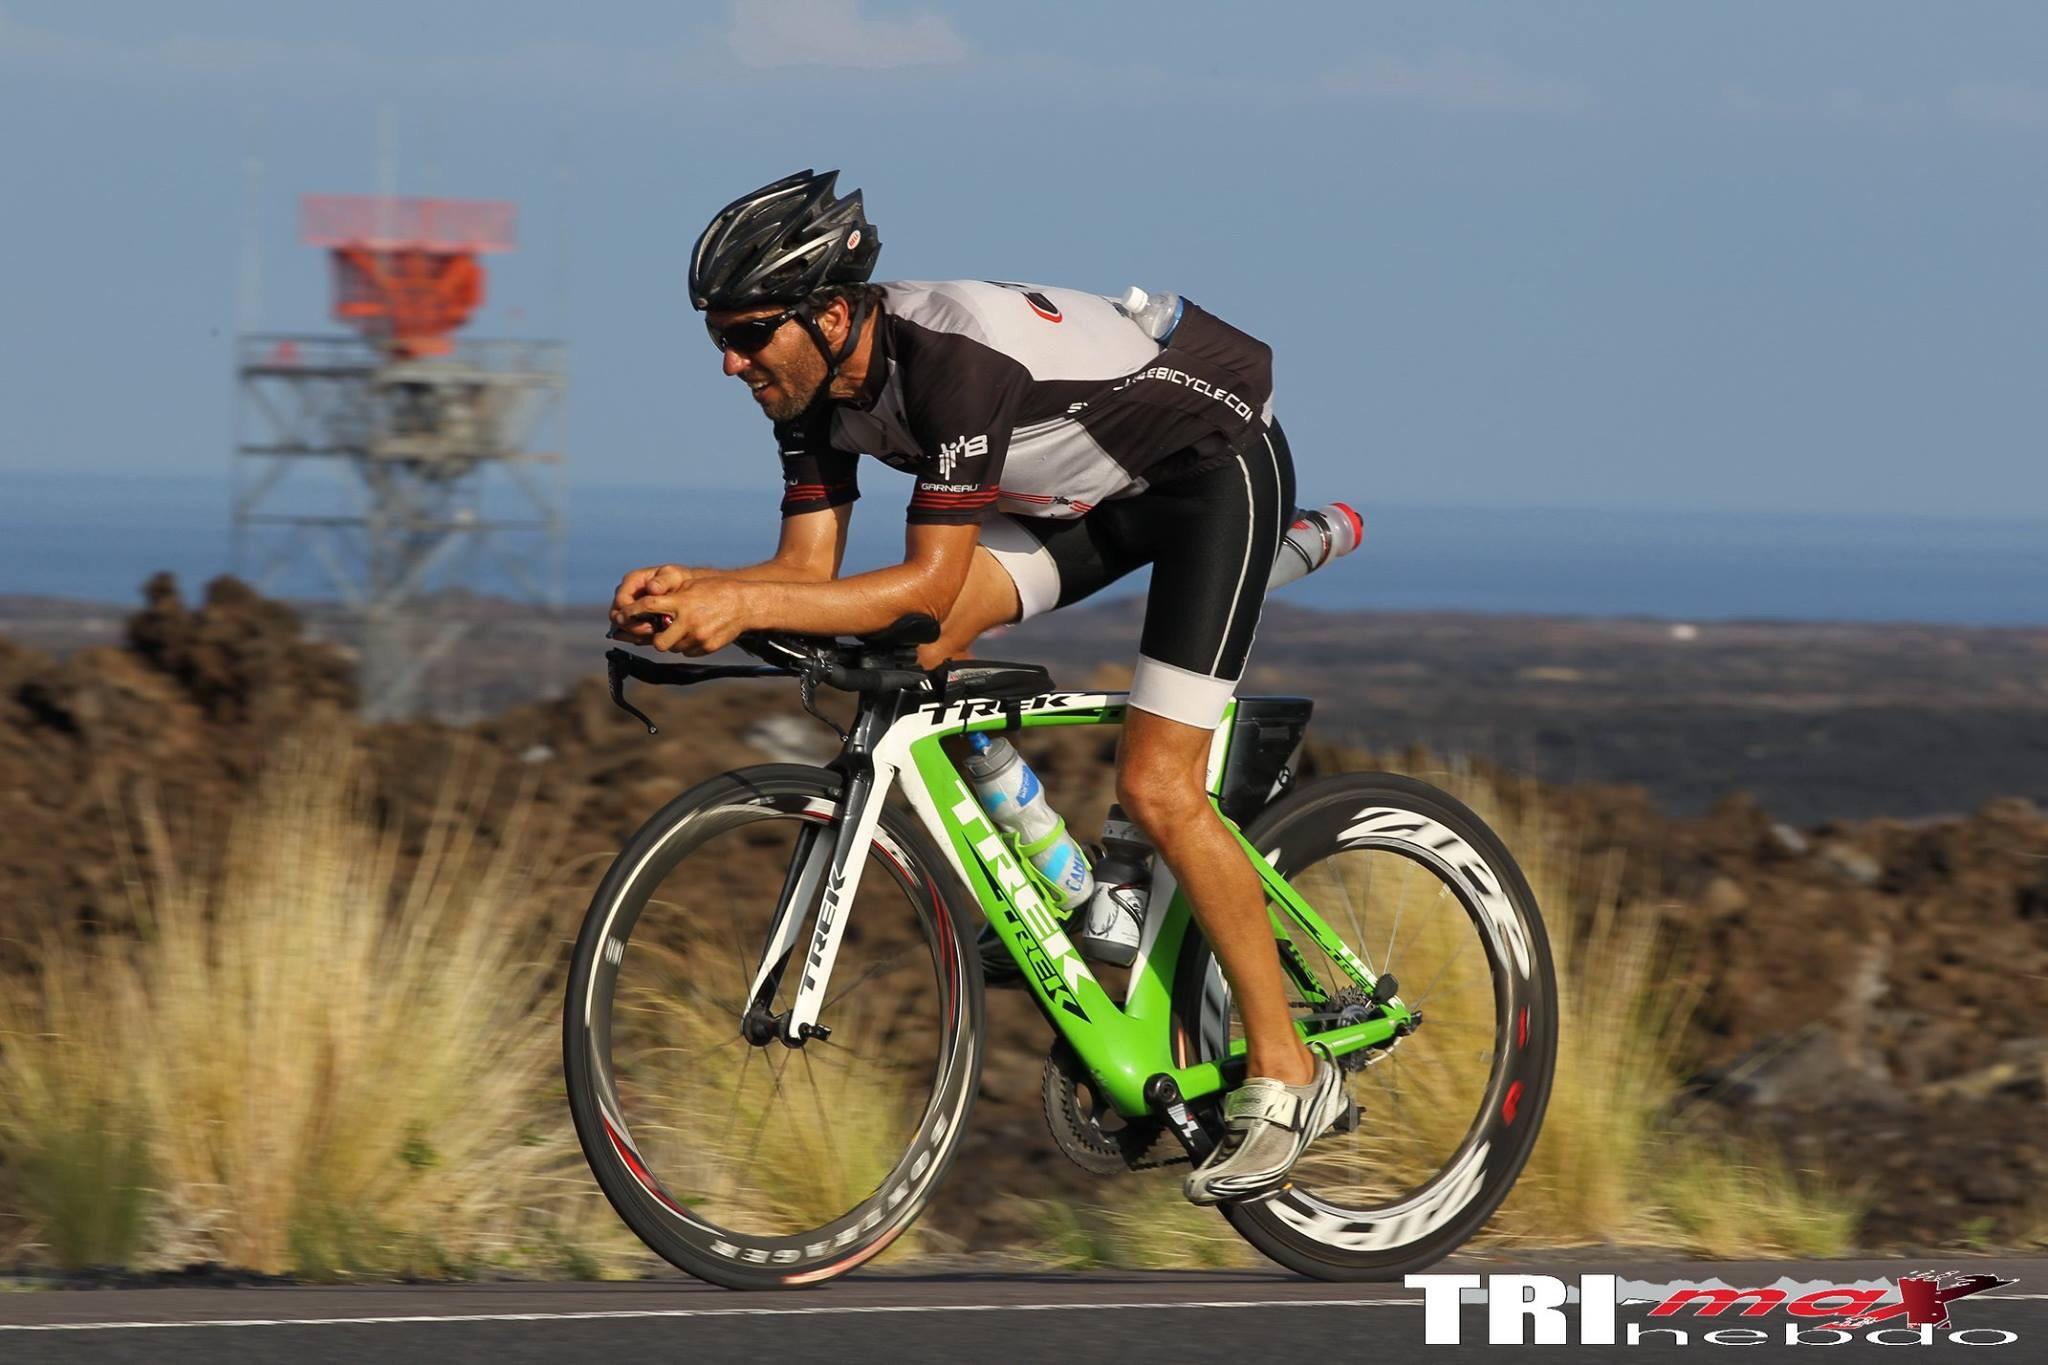 Trek Speed Concept - Green, White and Black Colour Scheme